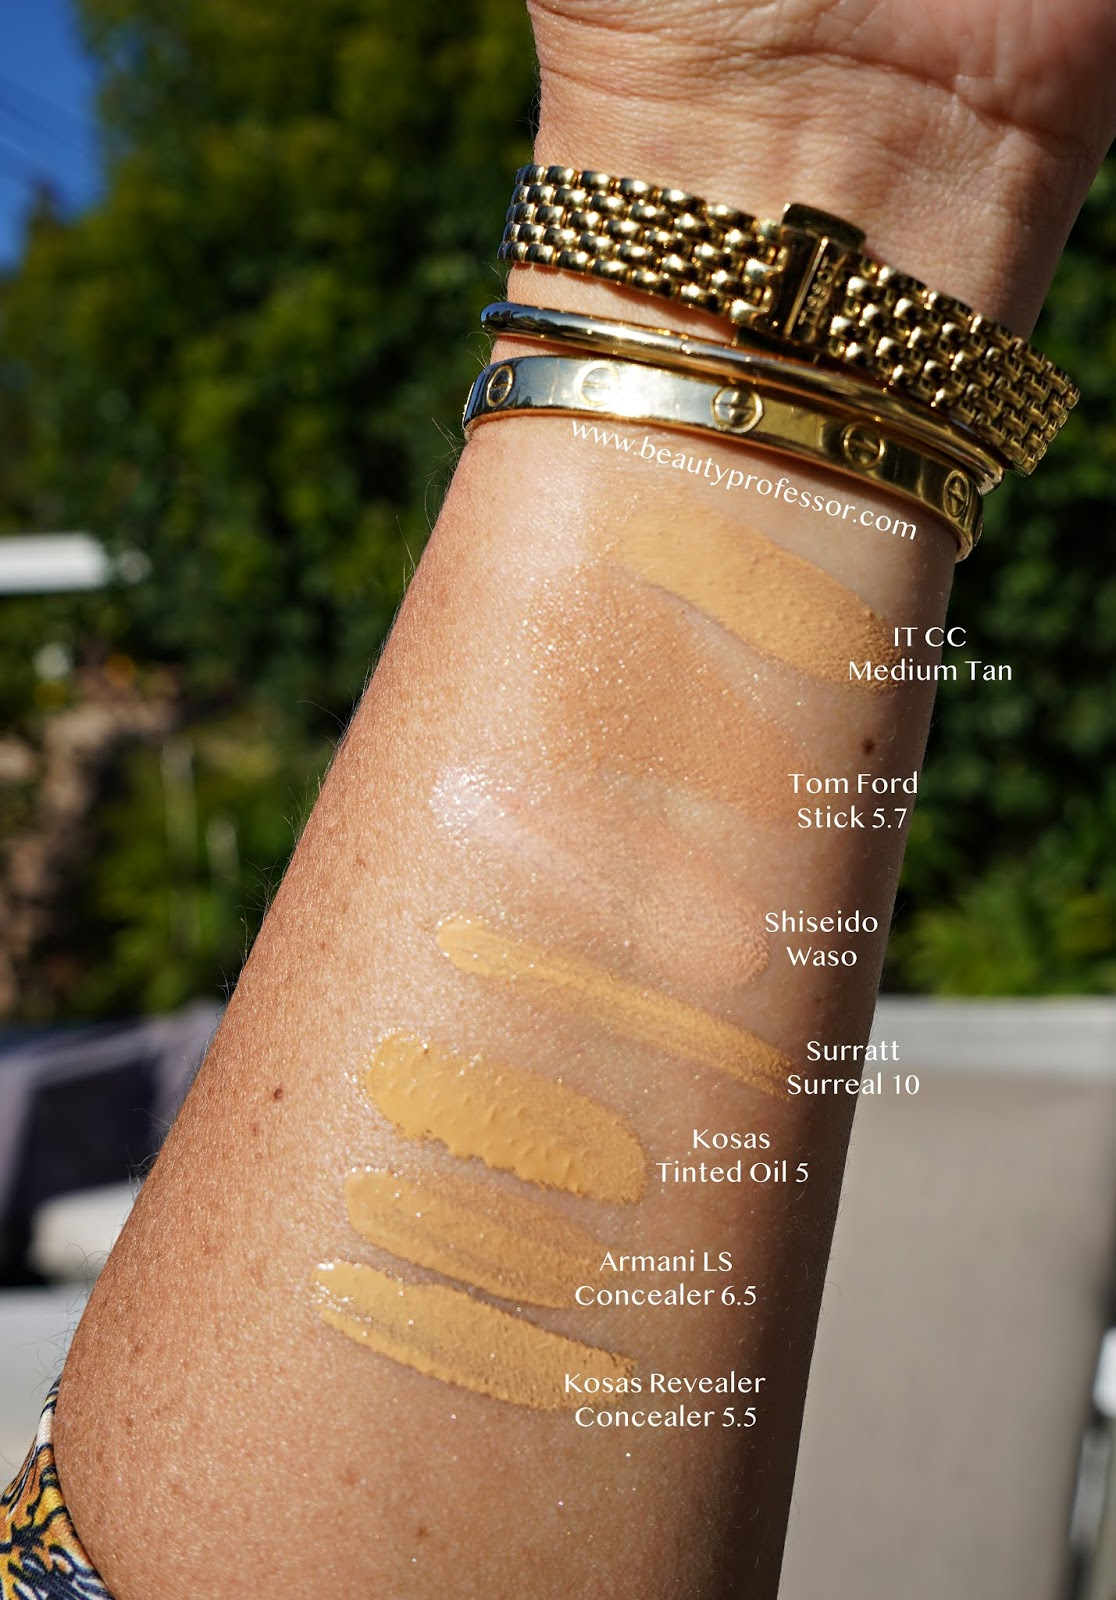 The Sun Show Moisturizing Baked Bronzer by Kosas #14